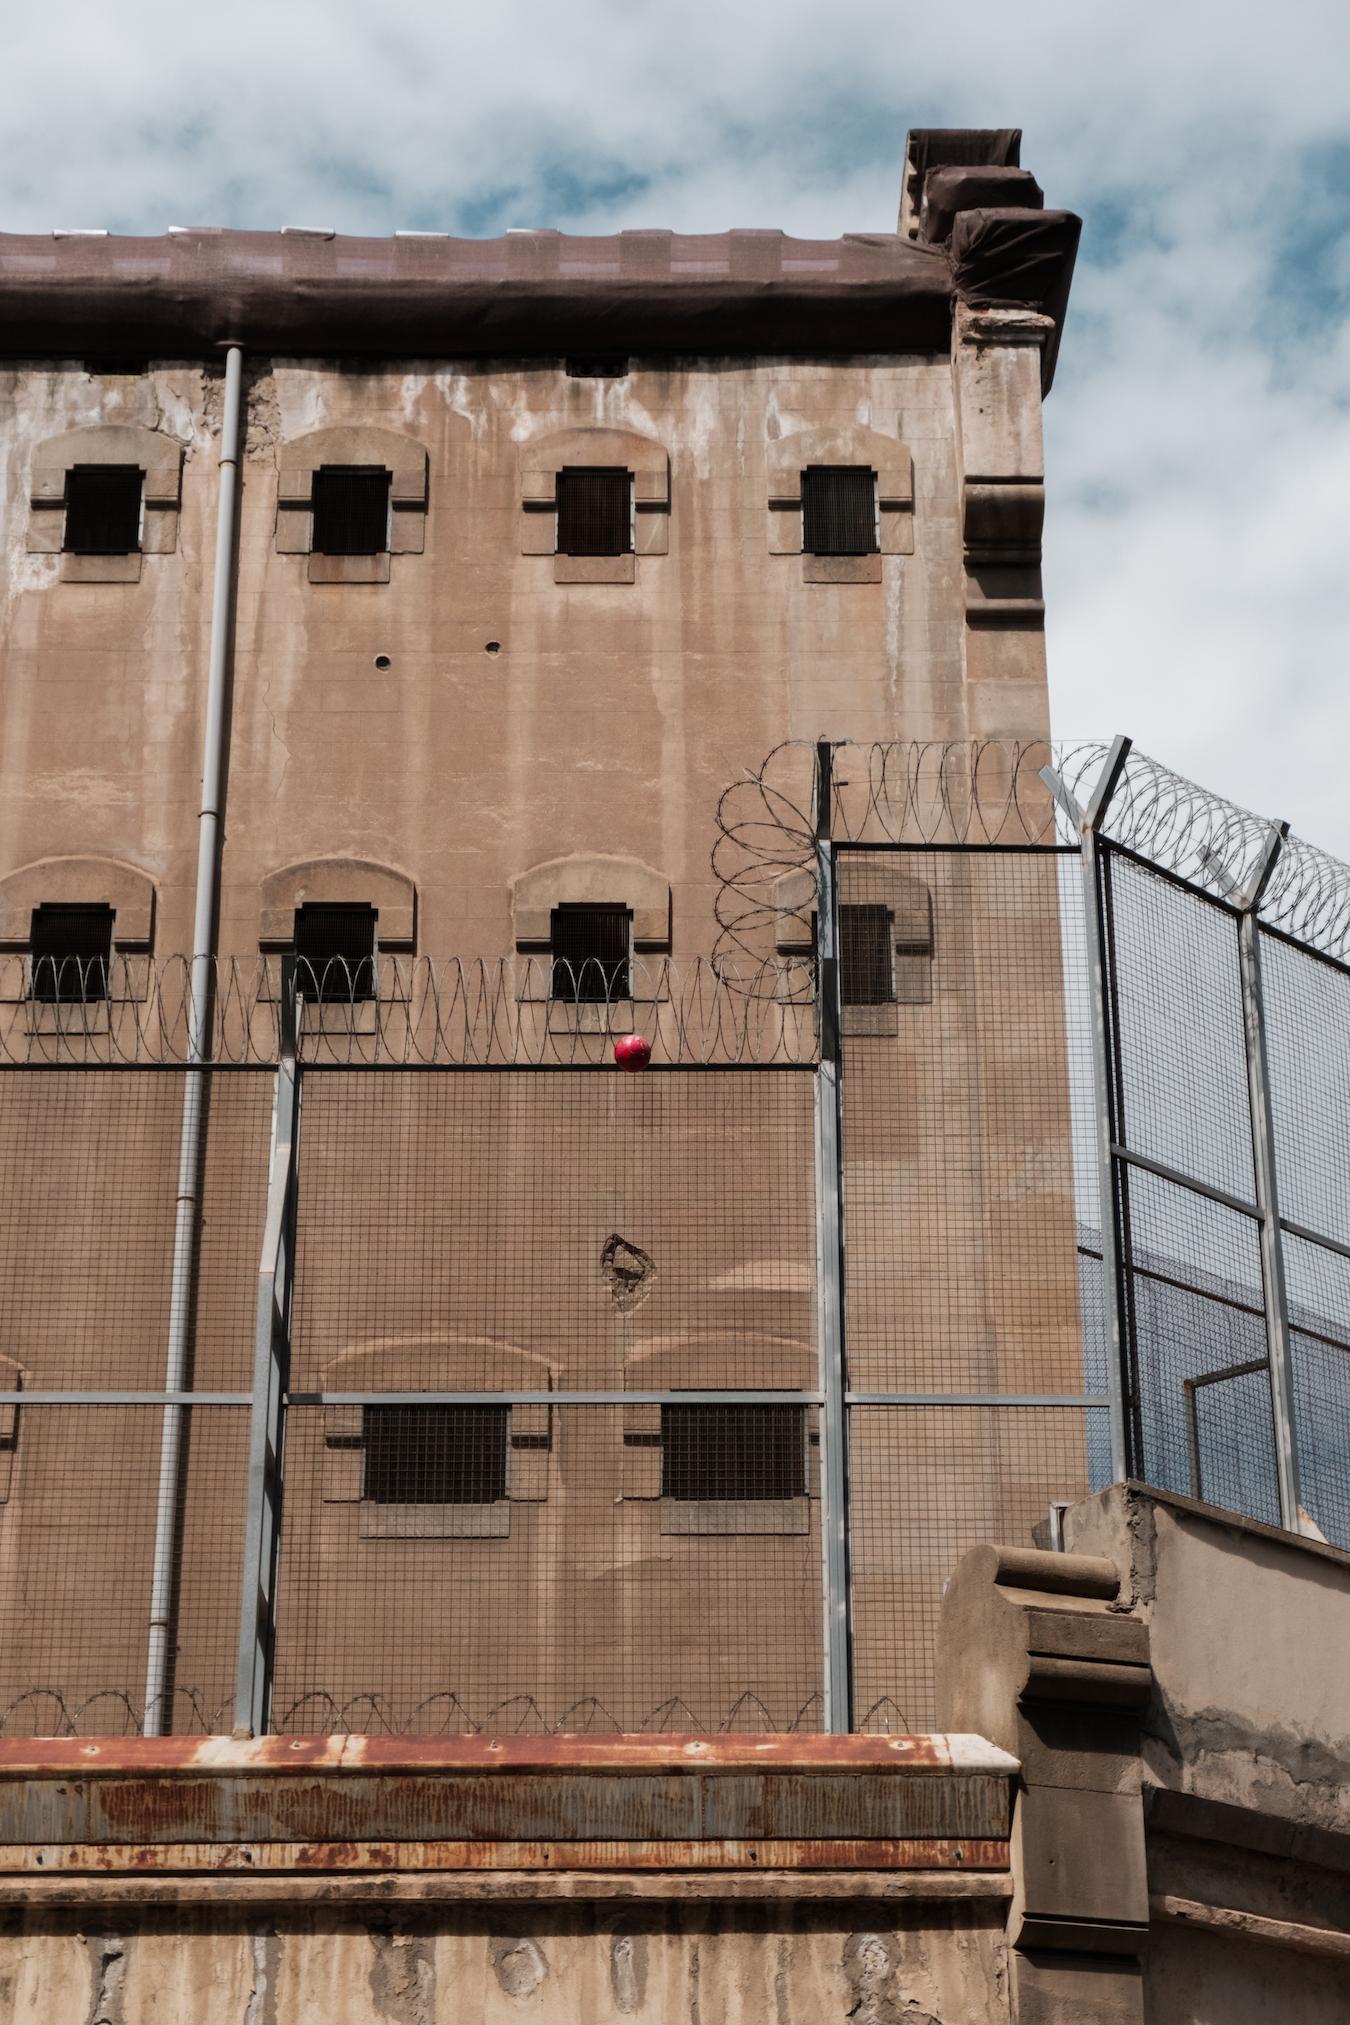 La Modelo Prison in Barcelona - Copyright Ben Holbrook 2018